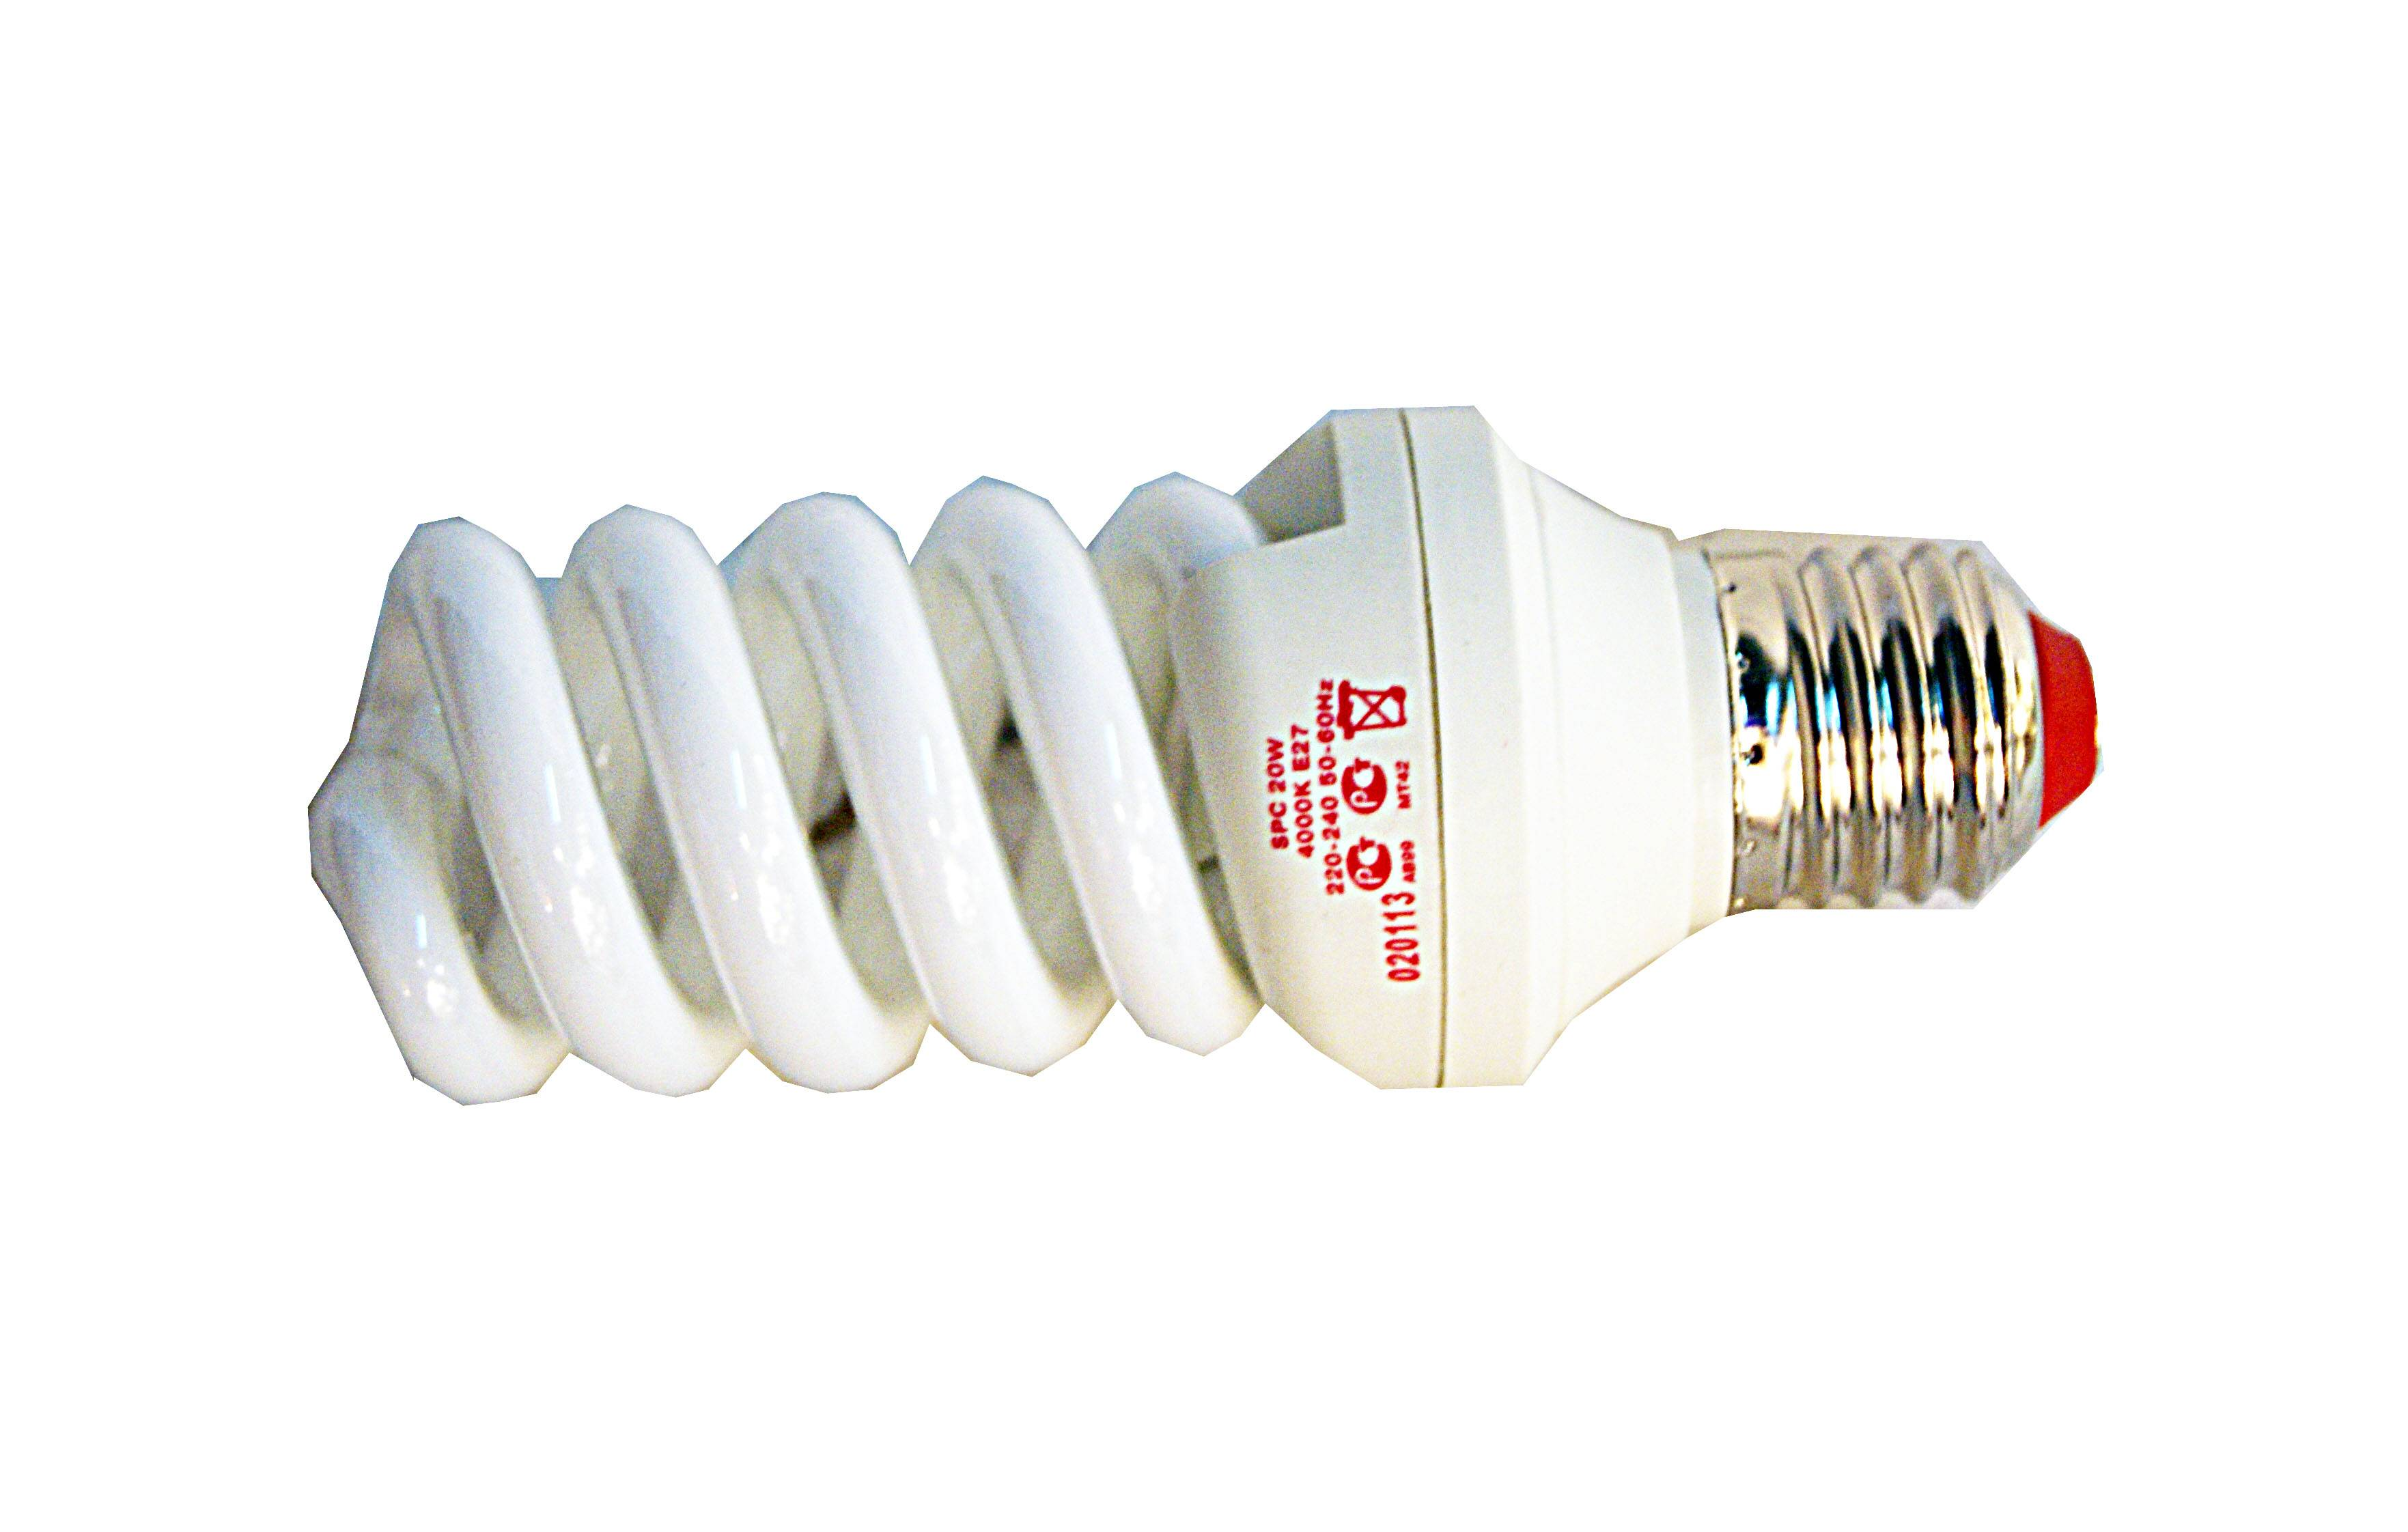 Лампочка Экономка A60 6W E27 160-260V 600Lm 3000K EcoLedFL6wA60E2727